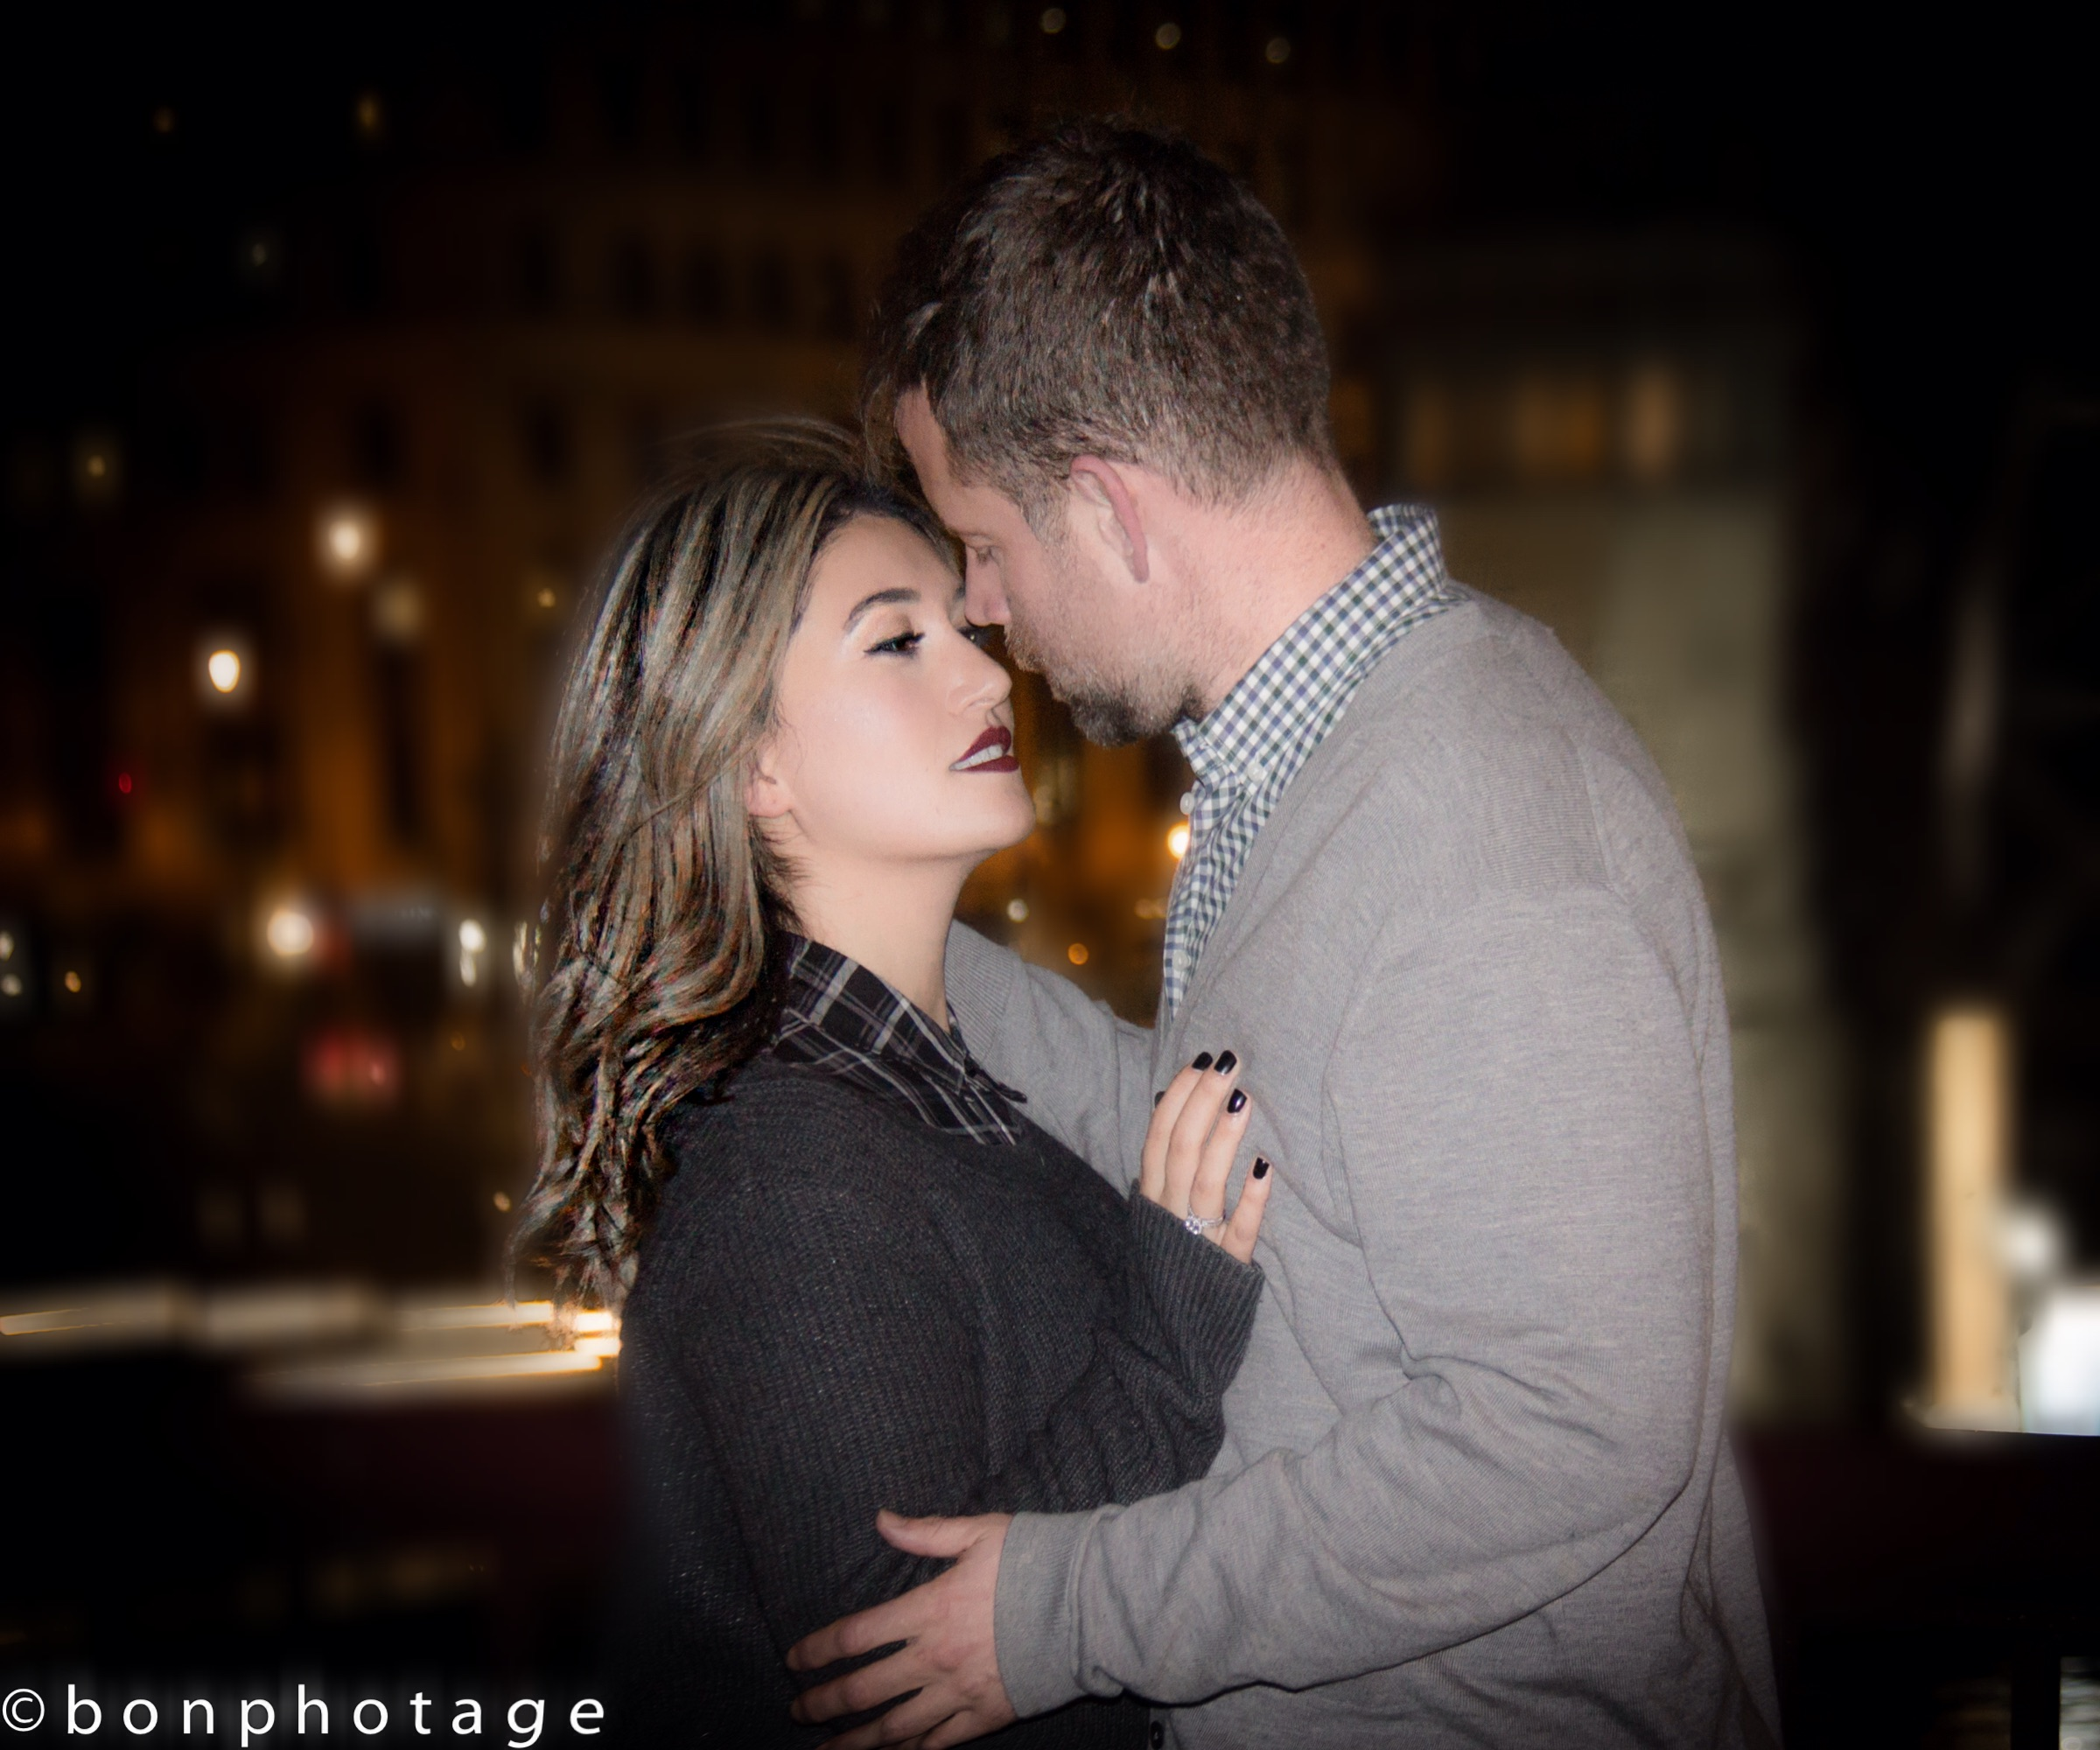 chicago romance photography engagement